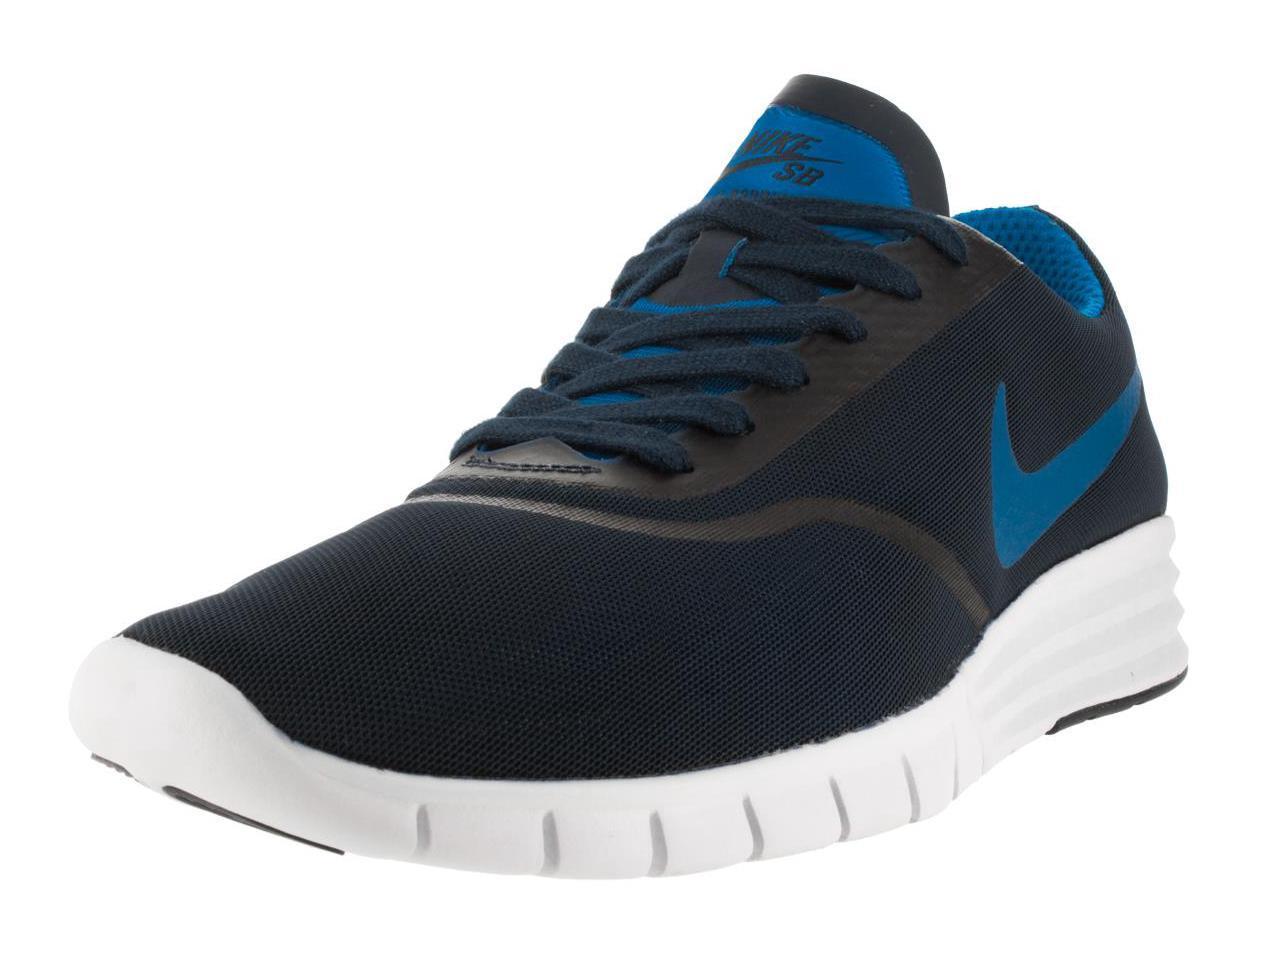 Nike Men's SB 9 Lunar Paul Rodriguez 9 SB Skate Shoe 426918